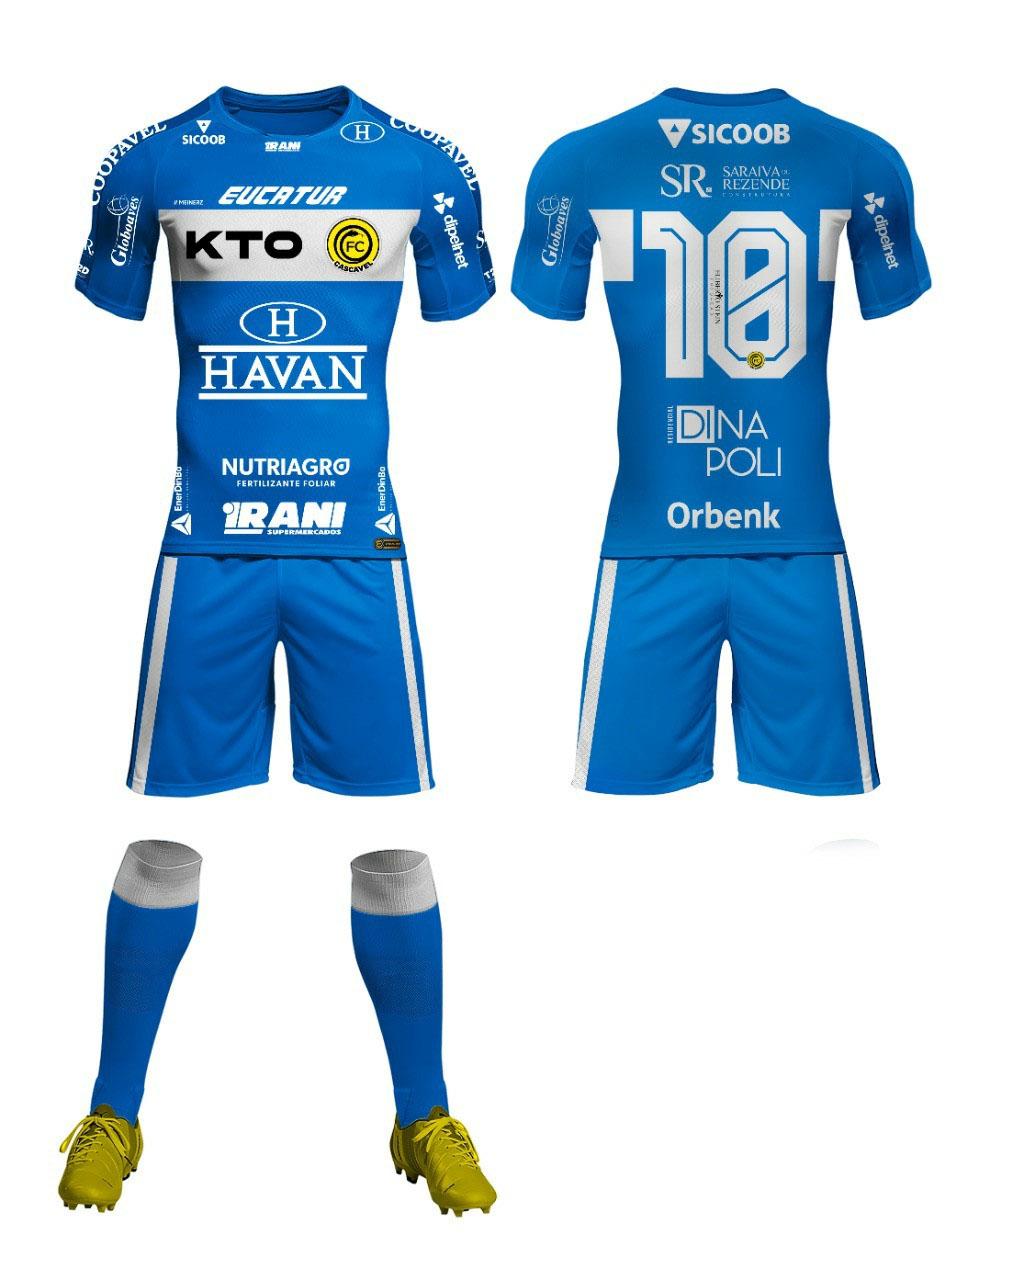 Camisas do FC Cascavel 2021 Meinerz